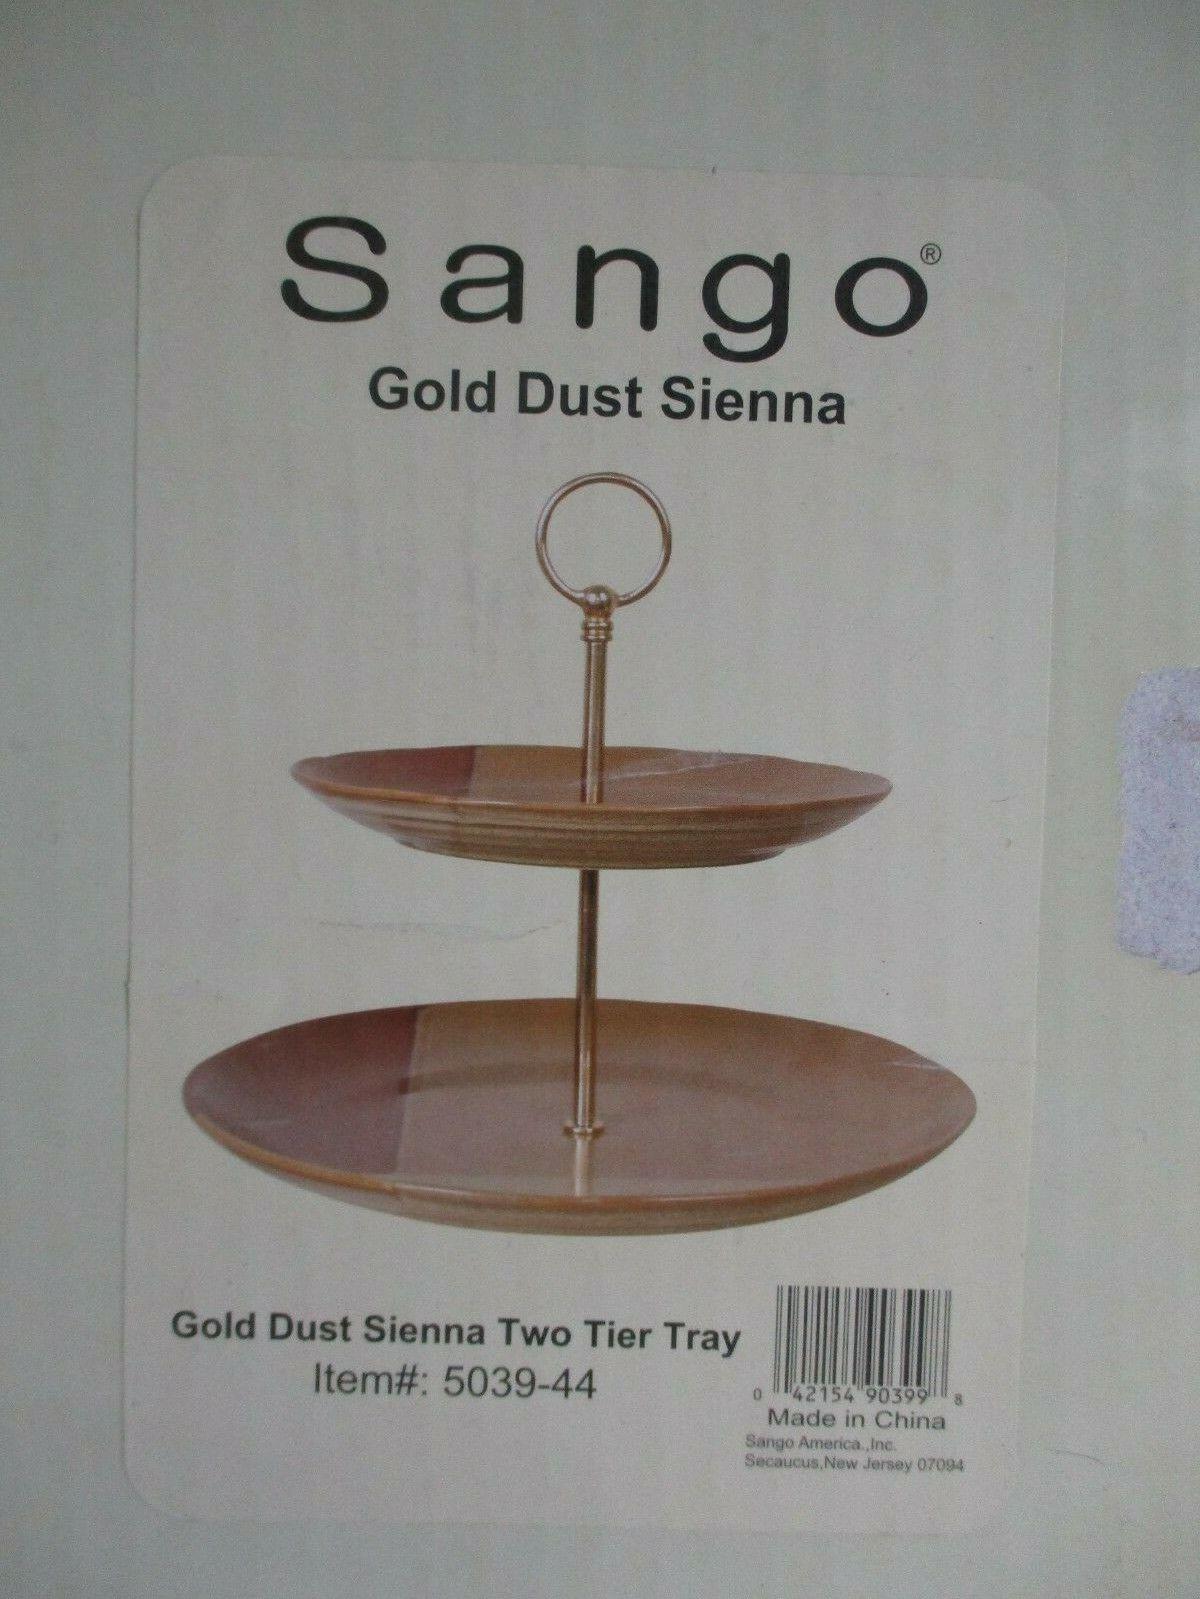 Sango Nova Gold Dust Sienna Ceramic Serving Tray 5039-44 New In Box